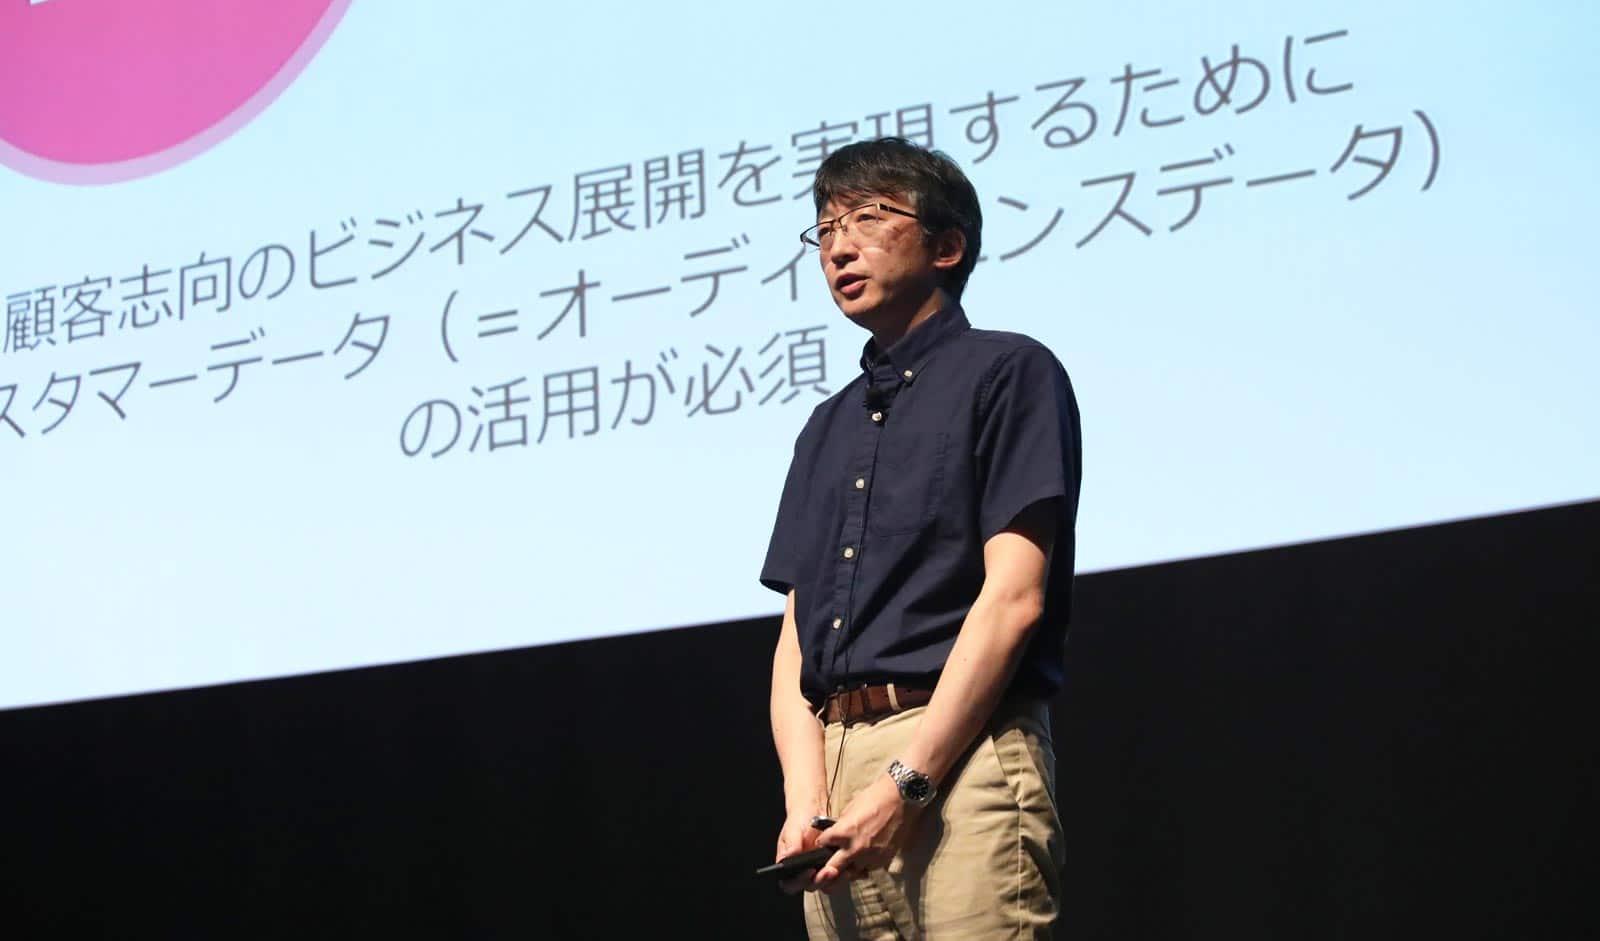 株式会社朝日新聞社 マーエティング本部 絵山 直樹 氏